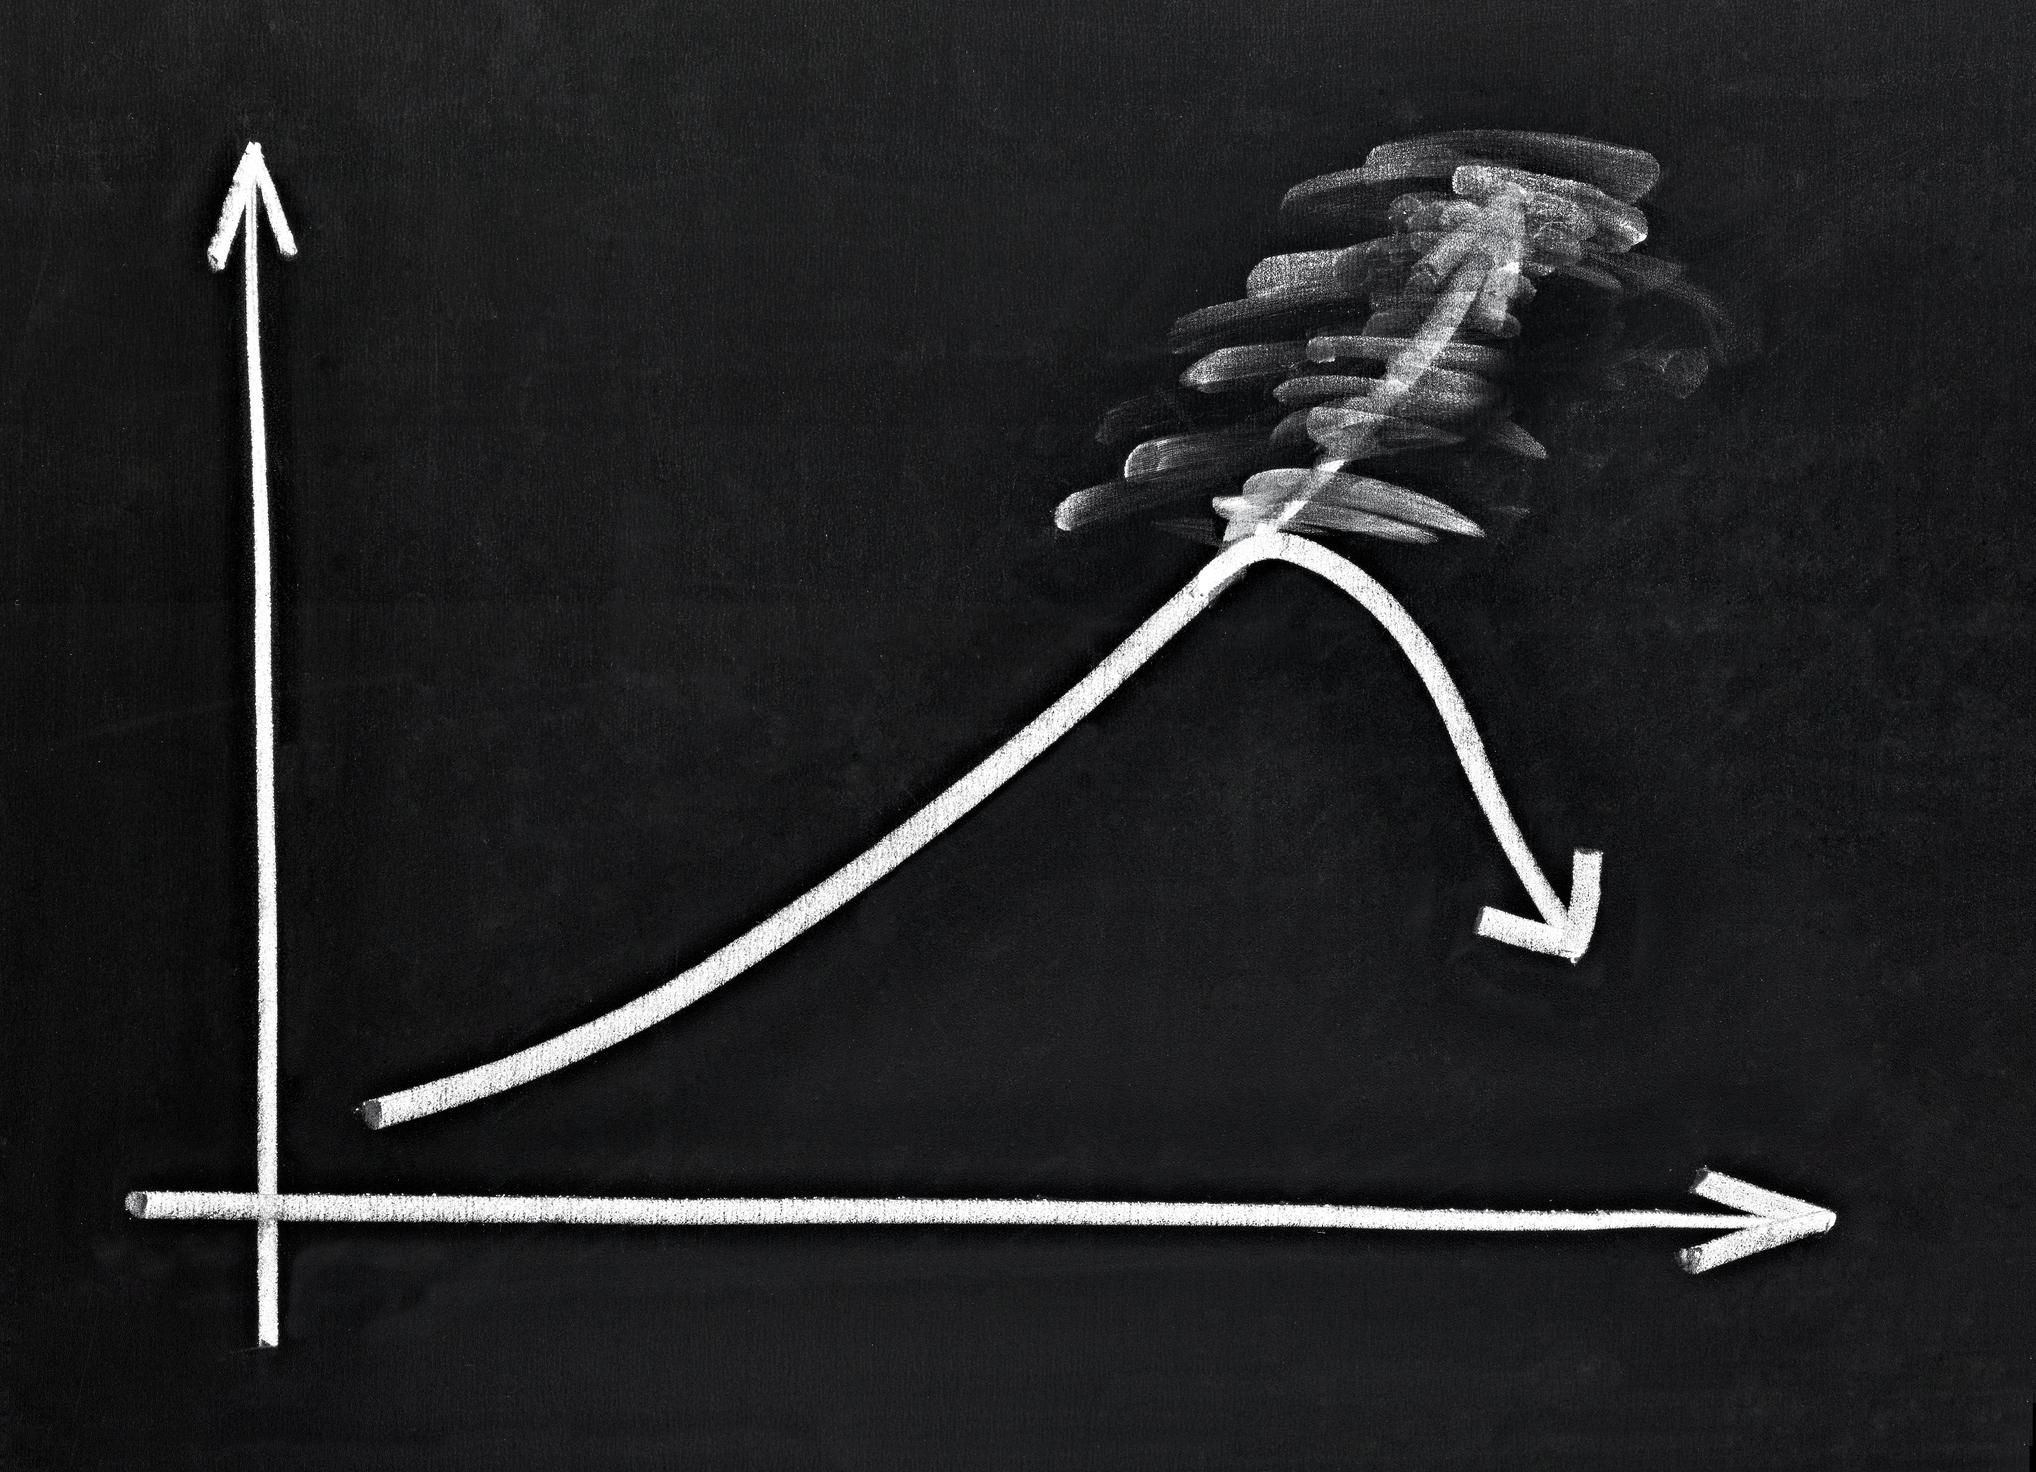 A blackboard chart showing a positive trend turn negative.